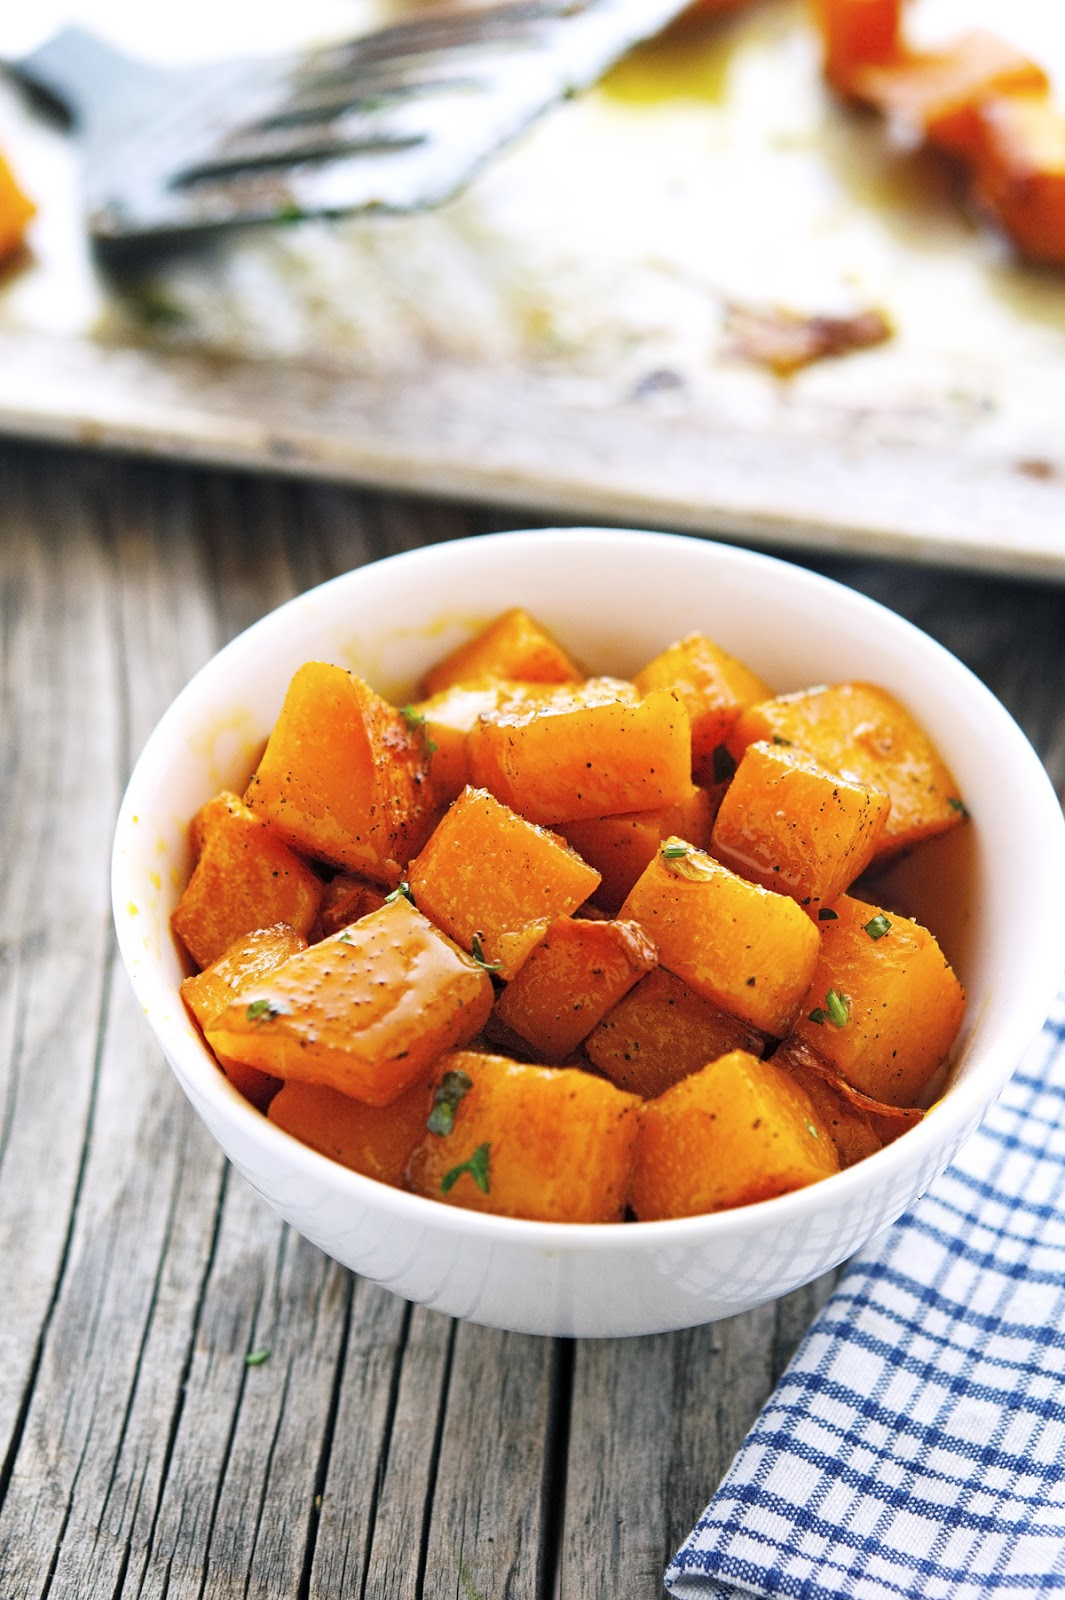 Spicy Maple-Glazed Butternut Squash